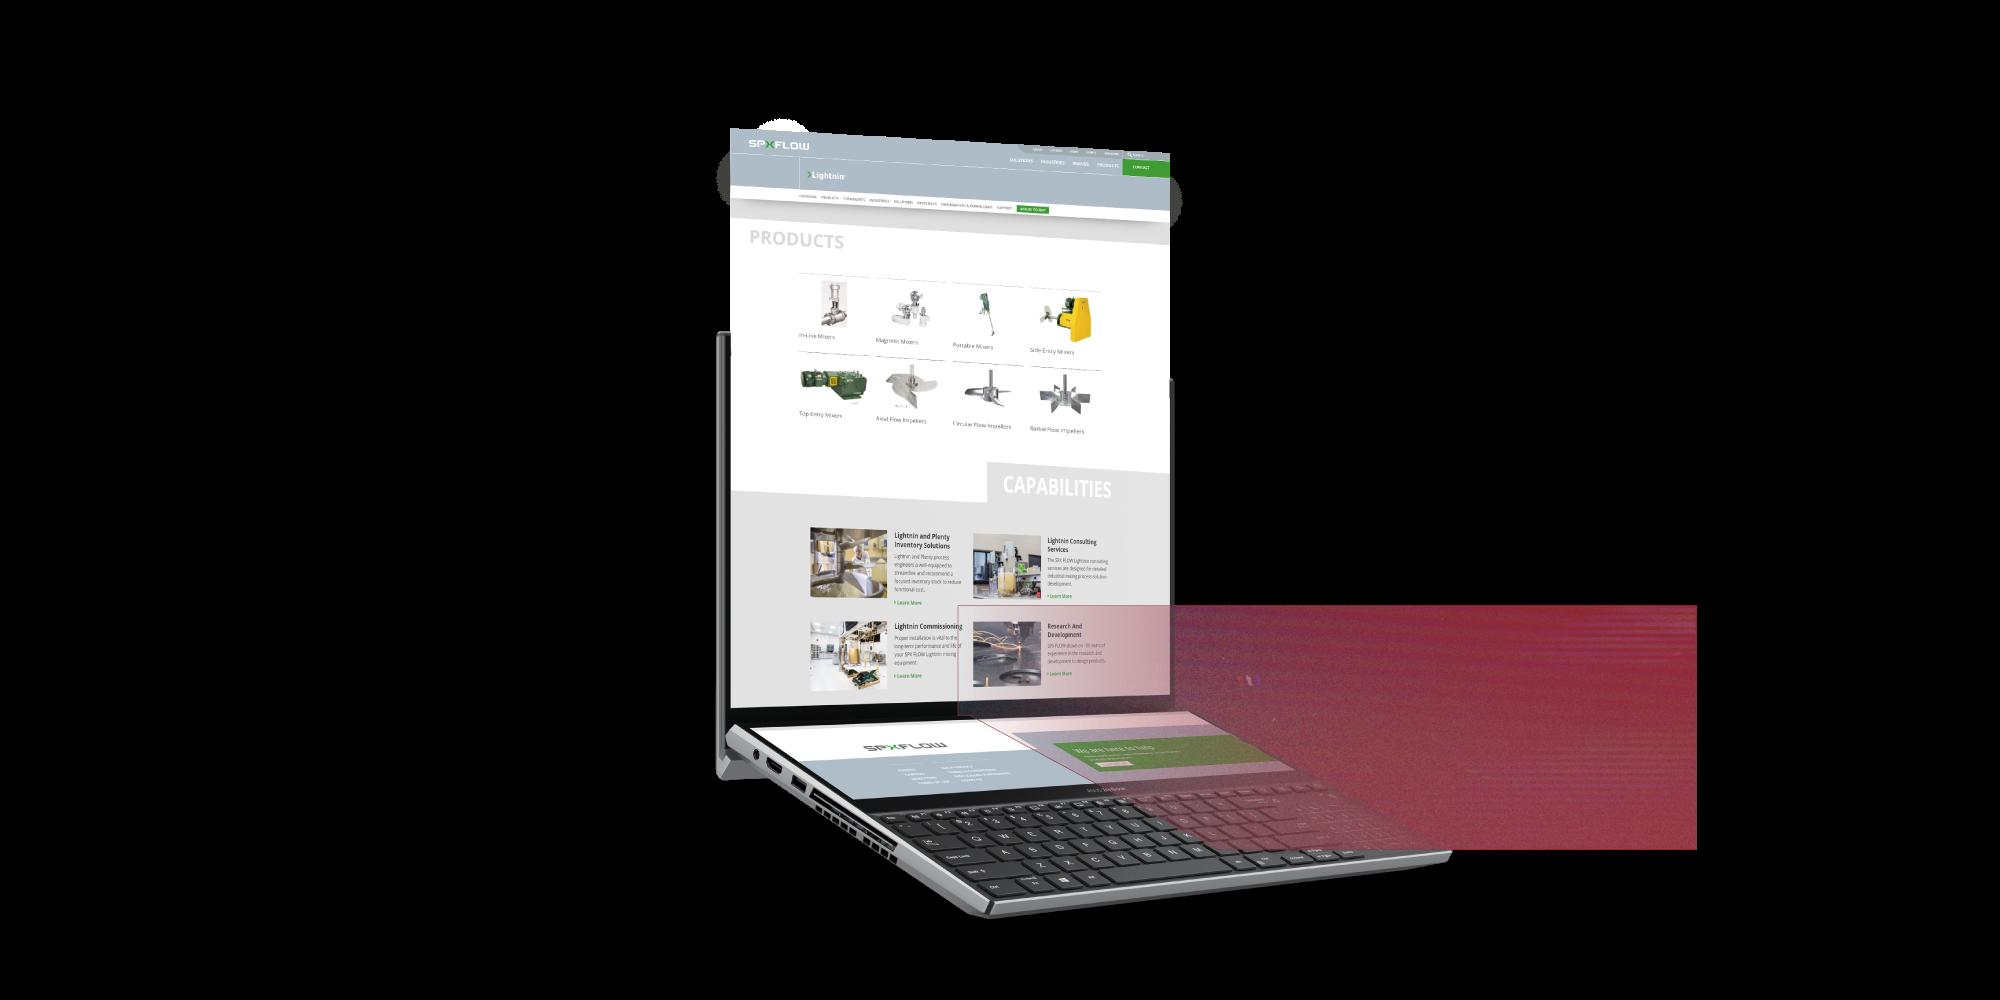 spxflow website redesign displayed on a computer mockup